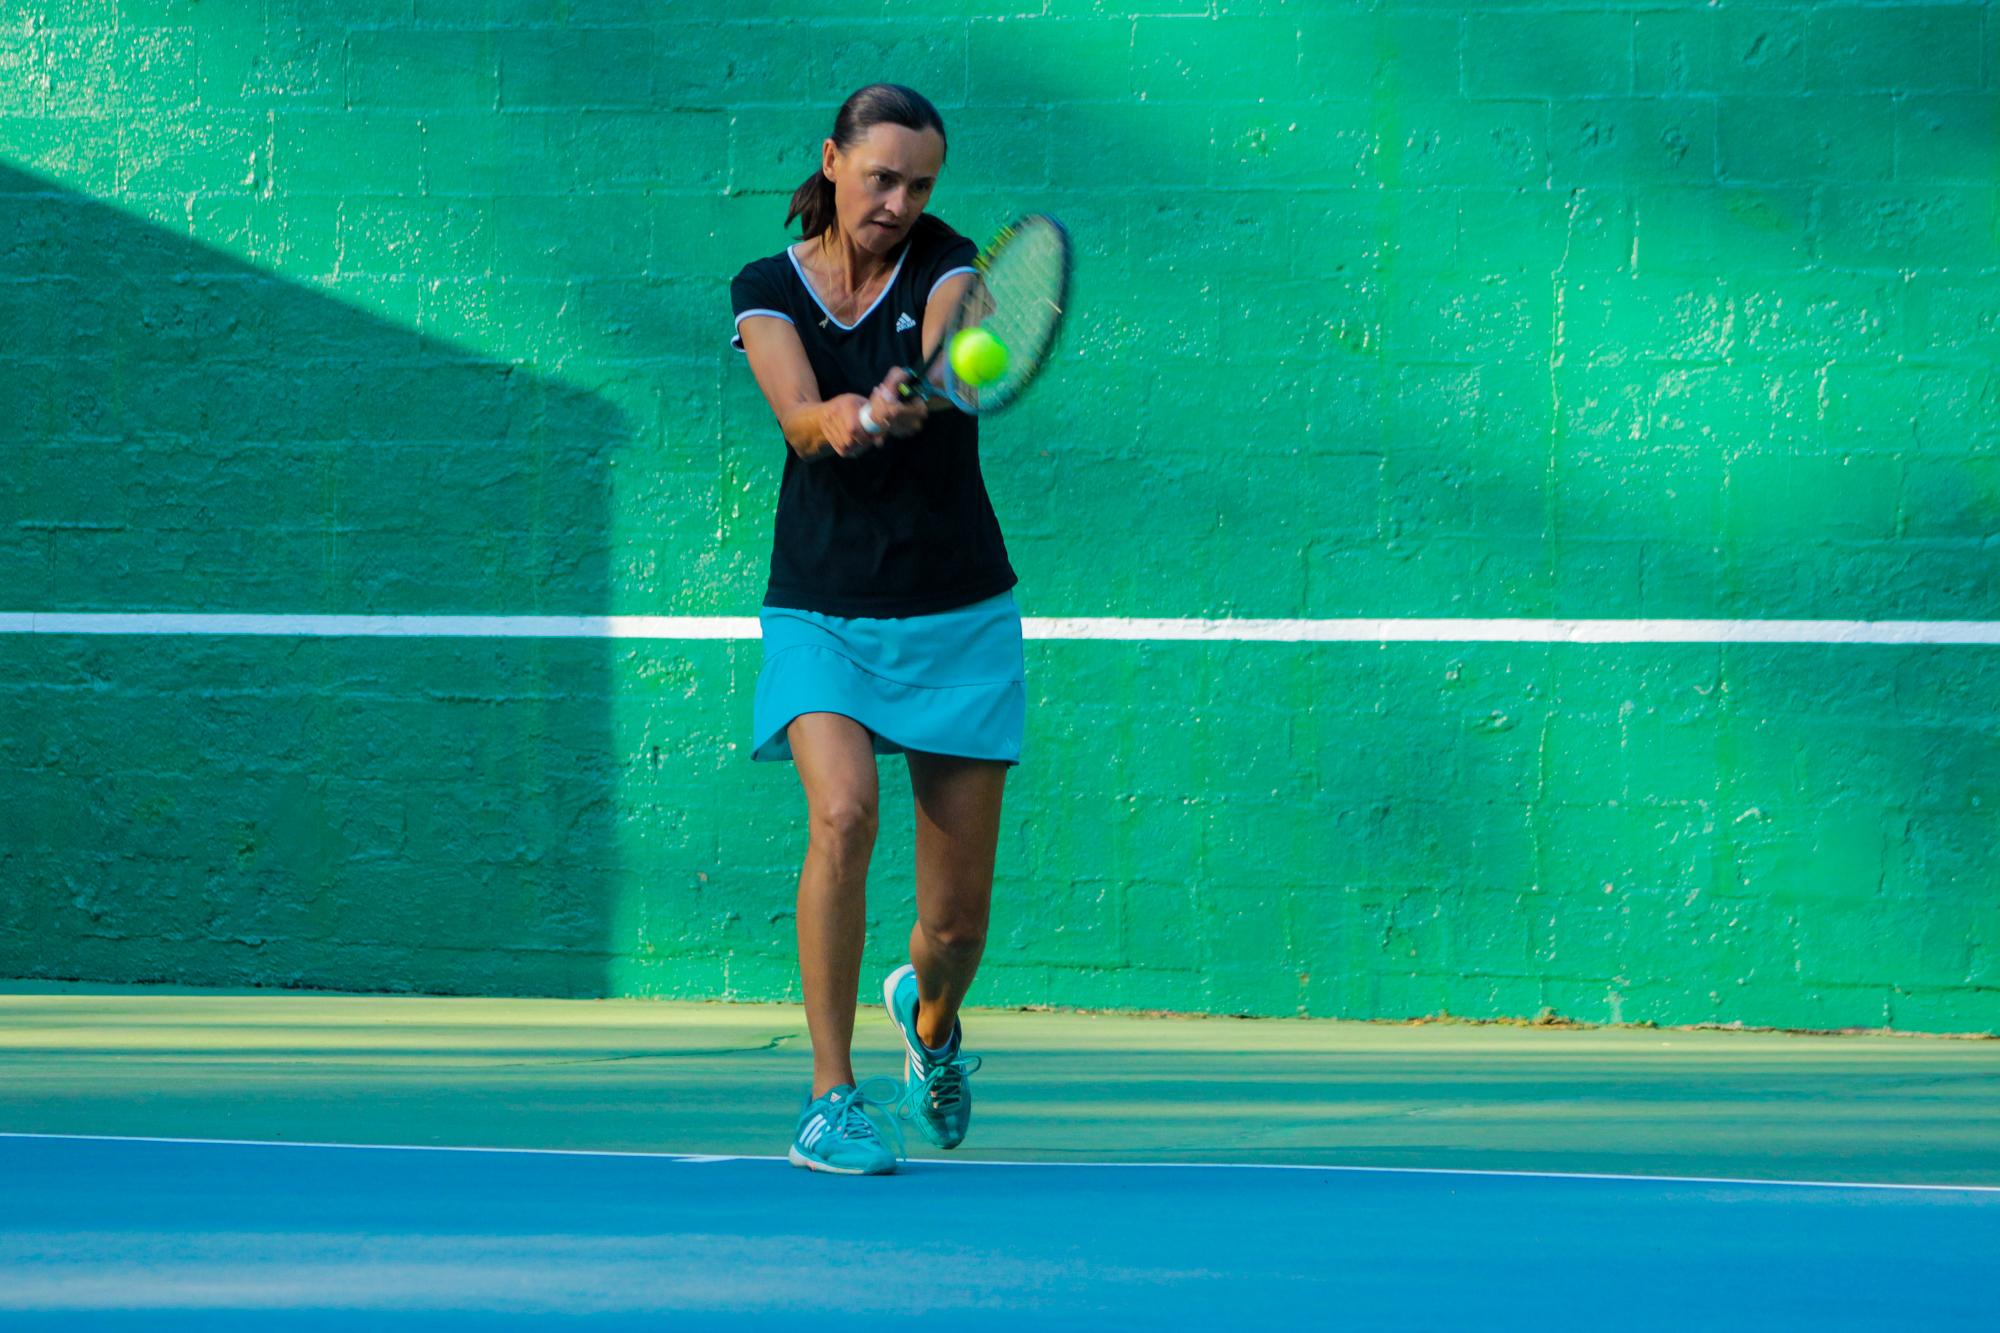 Alina Tennis.jpg